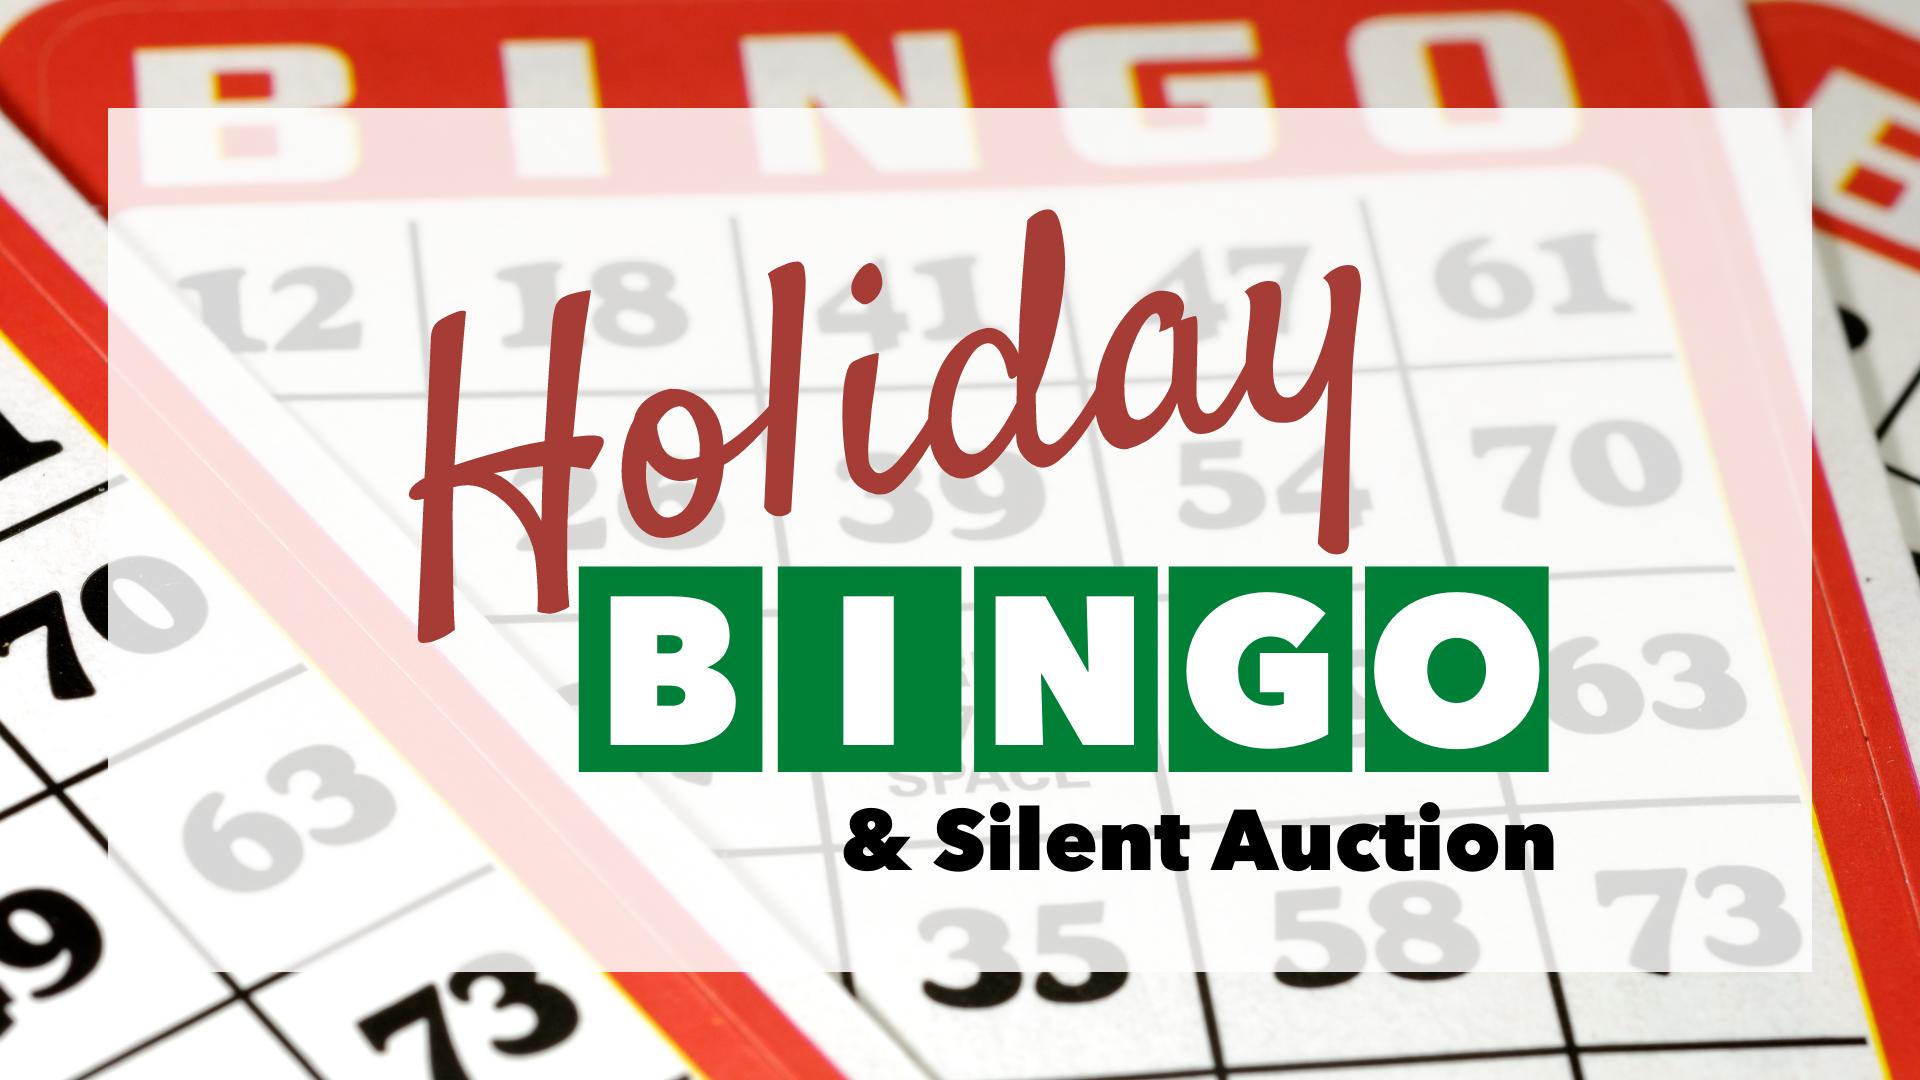 holiday bingo event photo